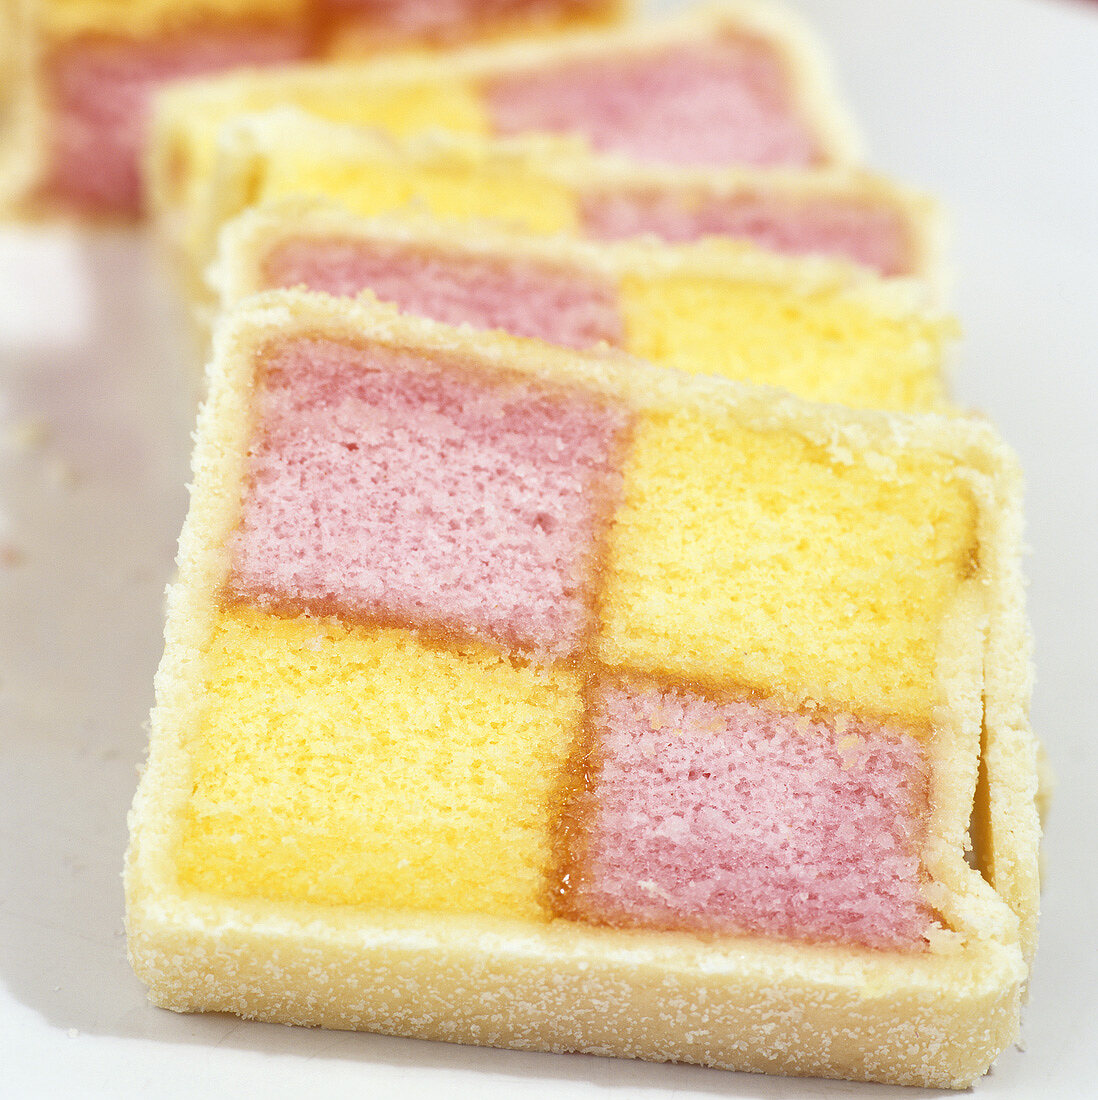 Battenberg cake (Two coloured sponge cake, UK)